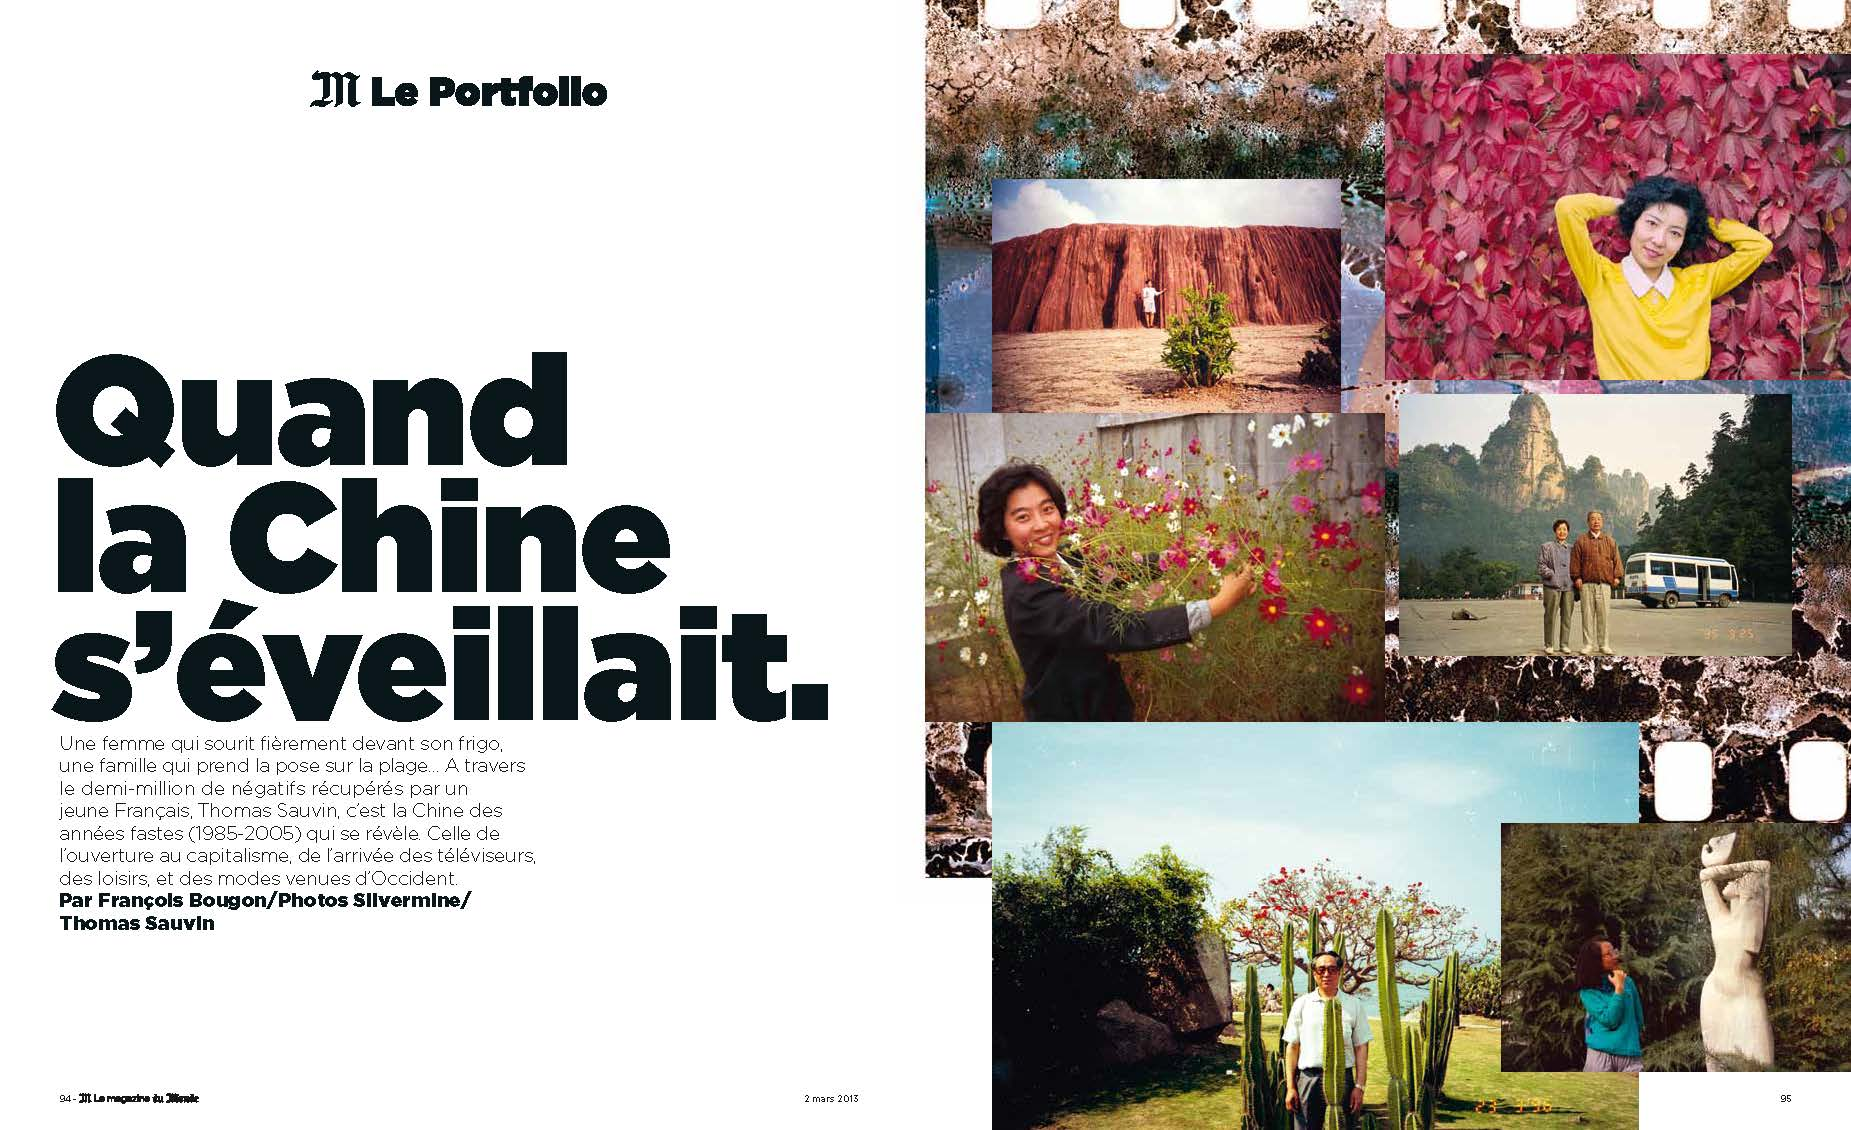 M le Magazine - 20130302 - Silvermine_Page_1.jpg